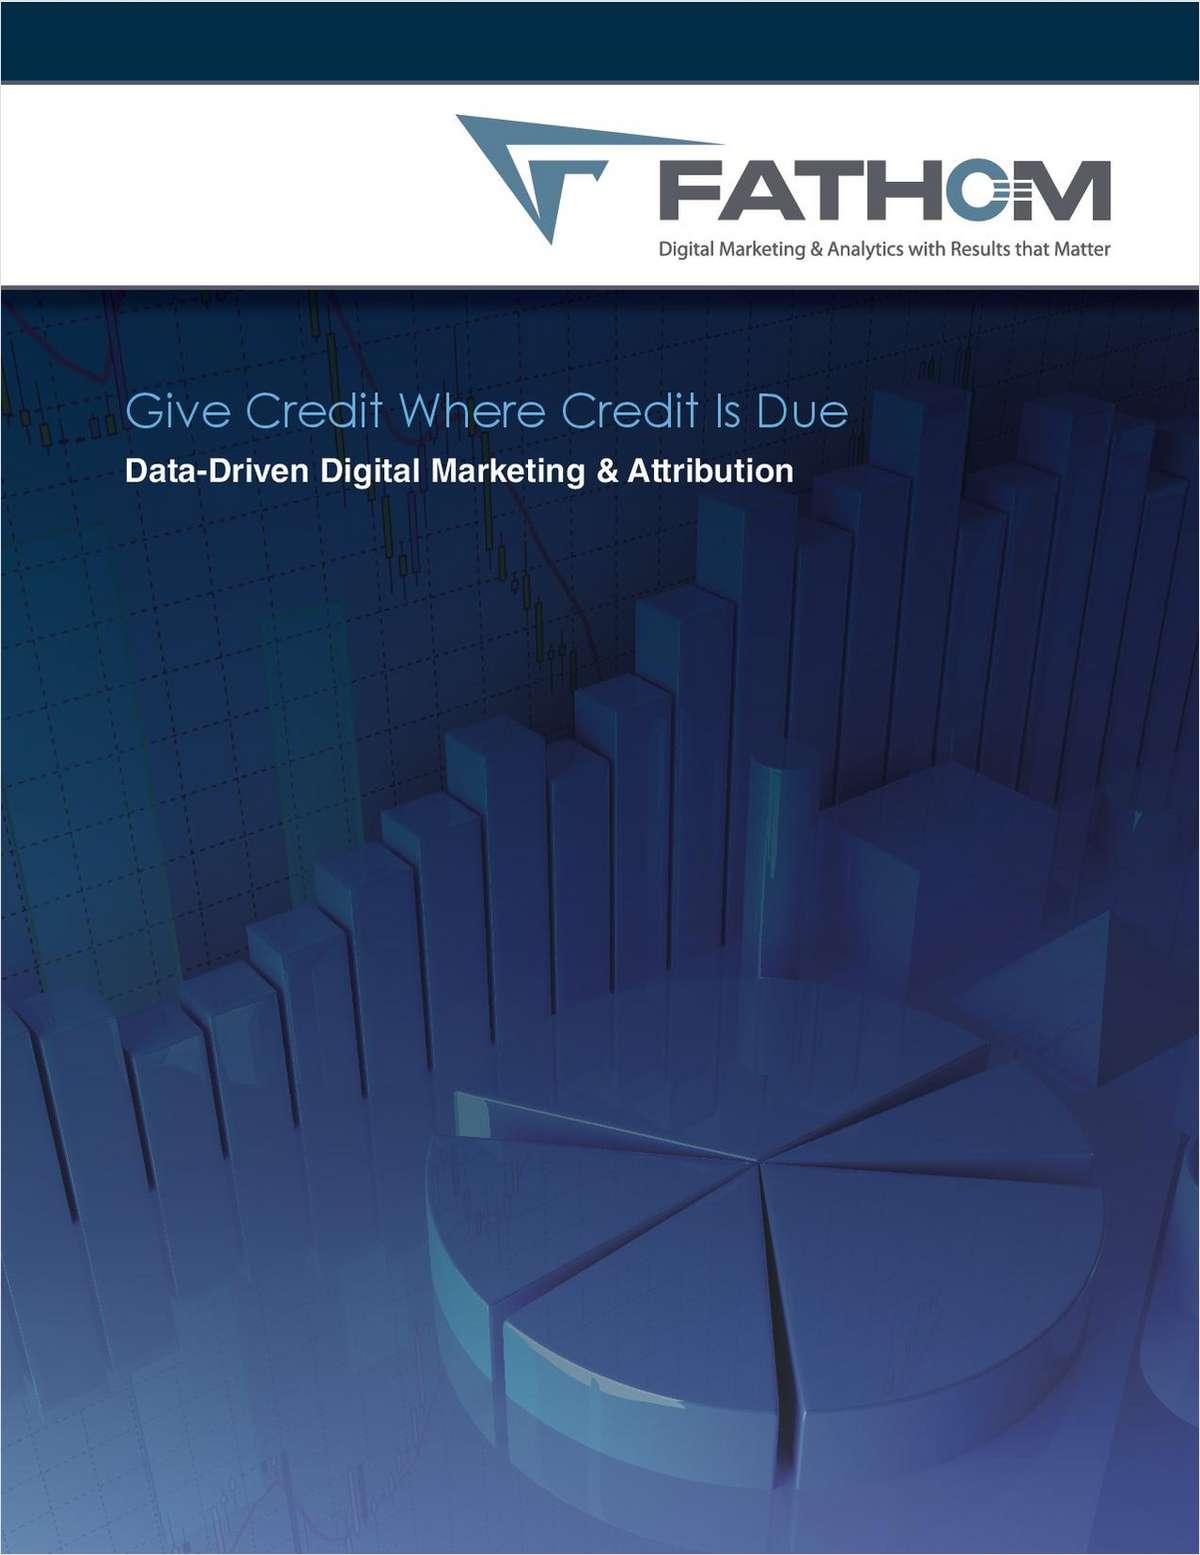 Giving Proper Credit: Data-Driven Digital Marketing & Attribution